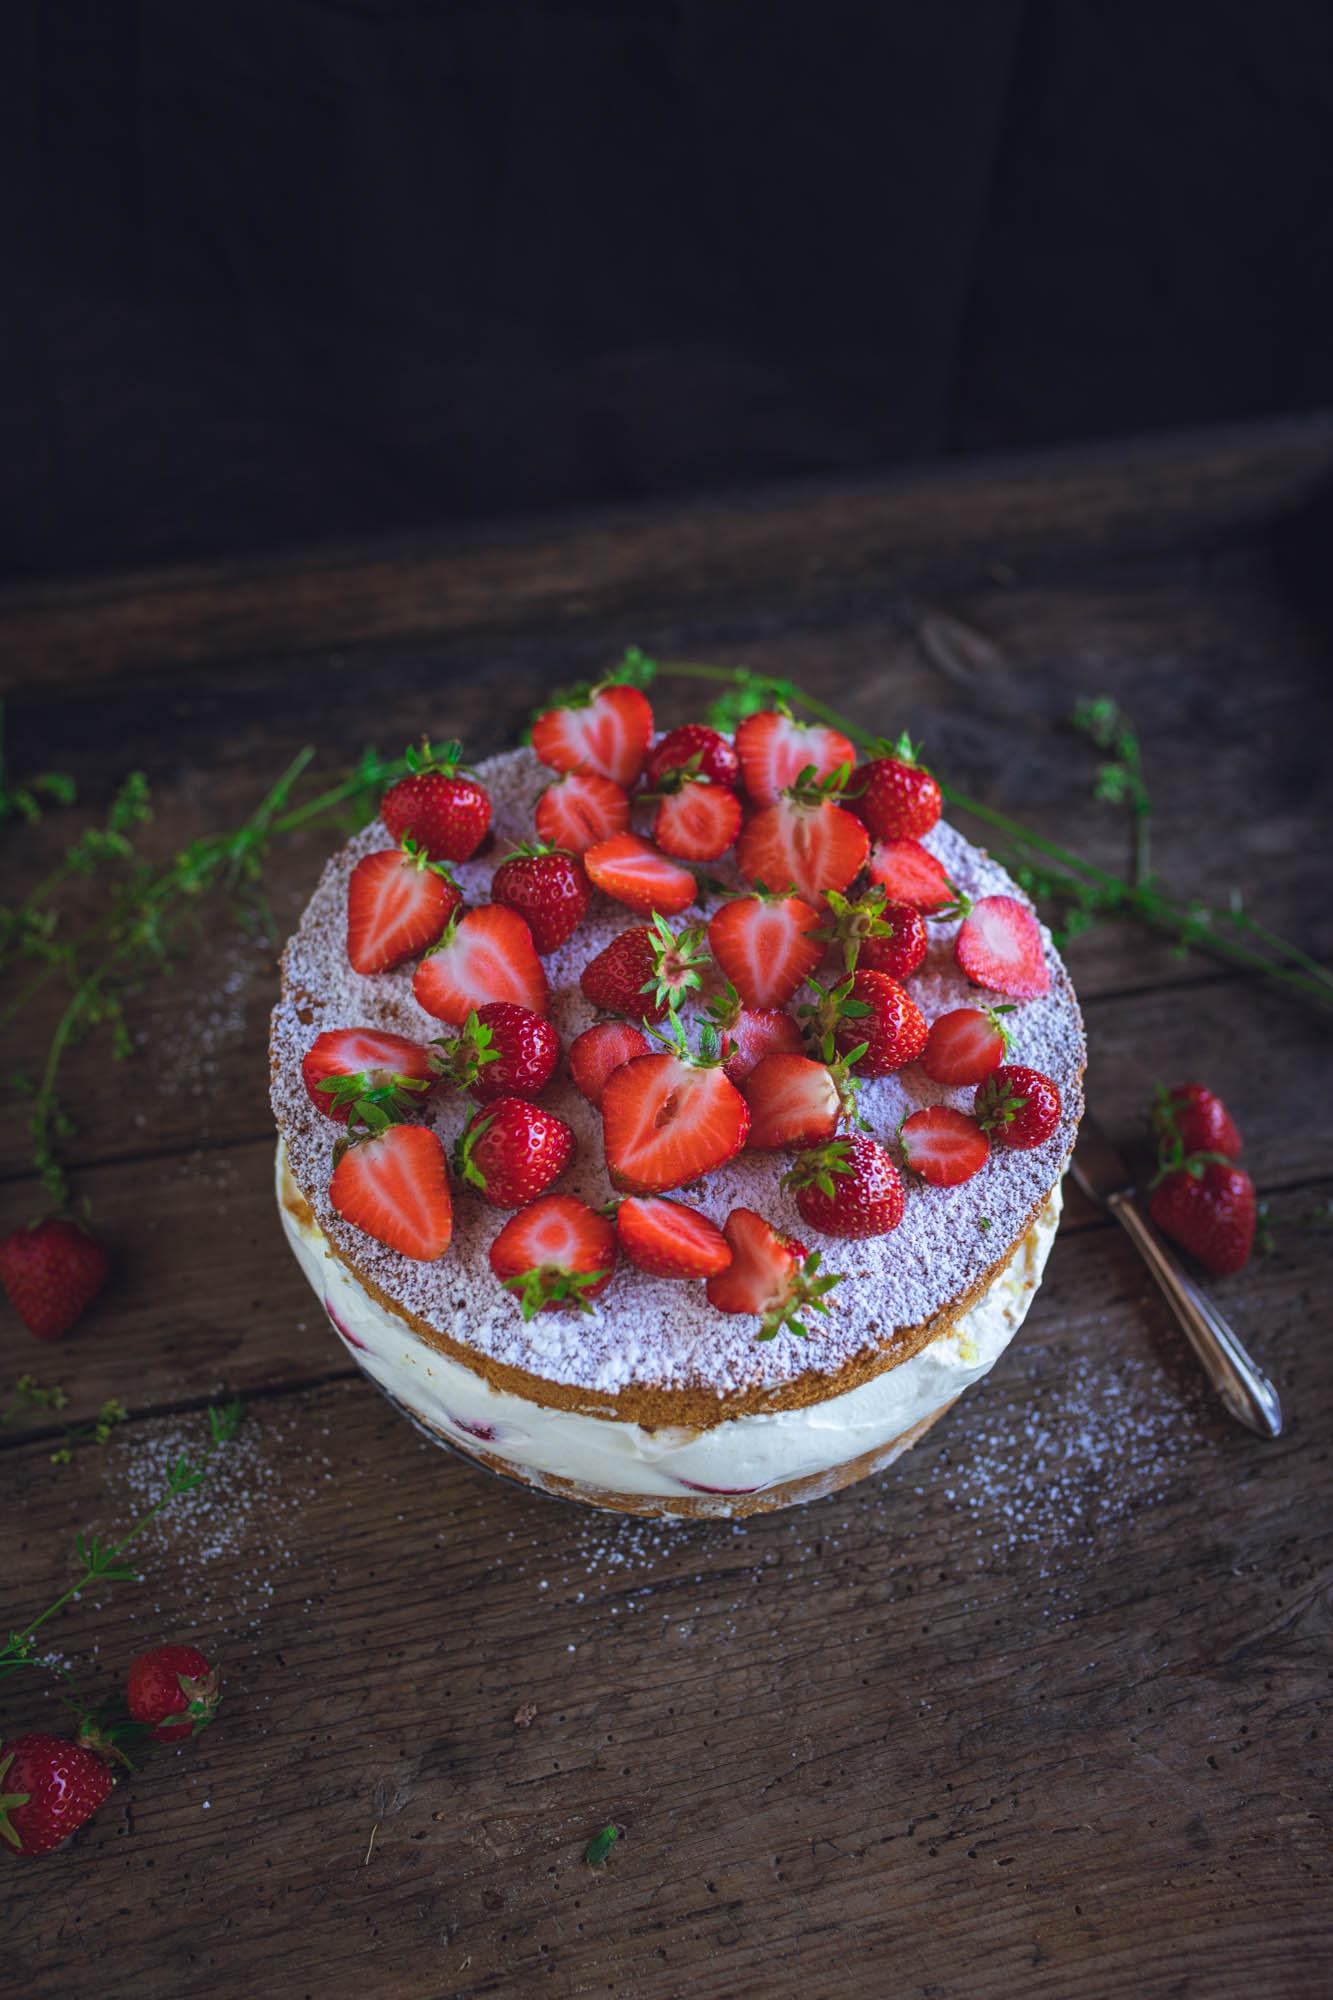 Rezept für Erdbeer-Käse-Sahne-Torte